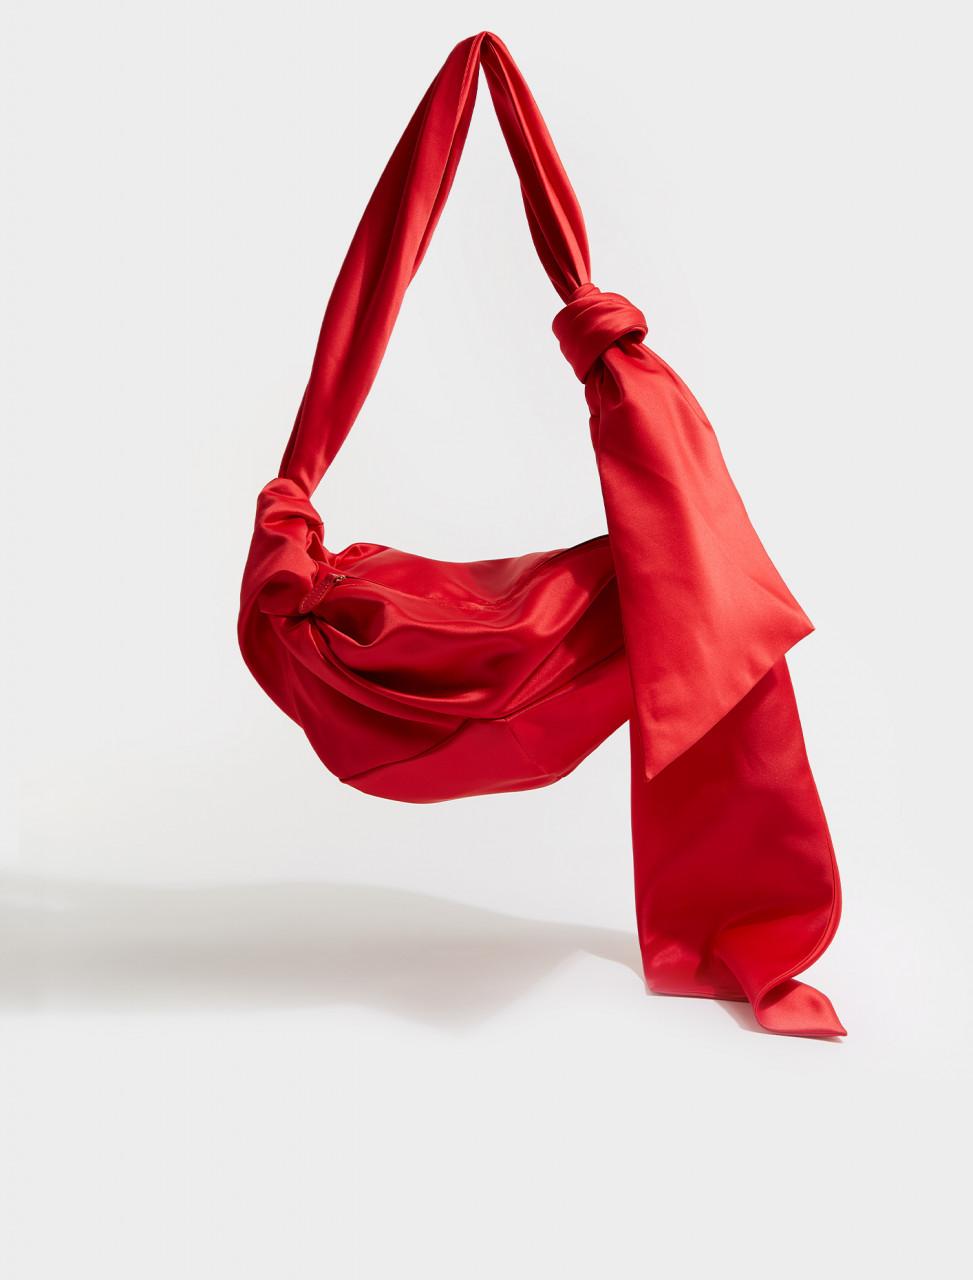 290-BAG96-0262 SIMONE ROCHA LARGE SATIN WRAP SHOULDER BAG RED